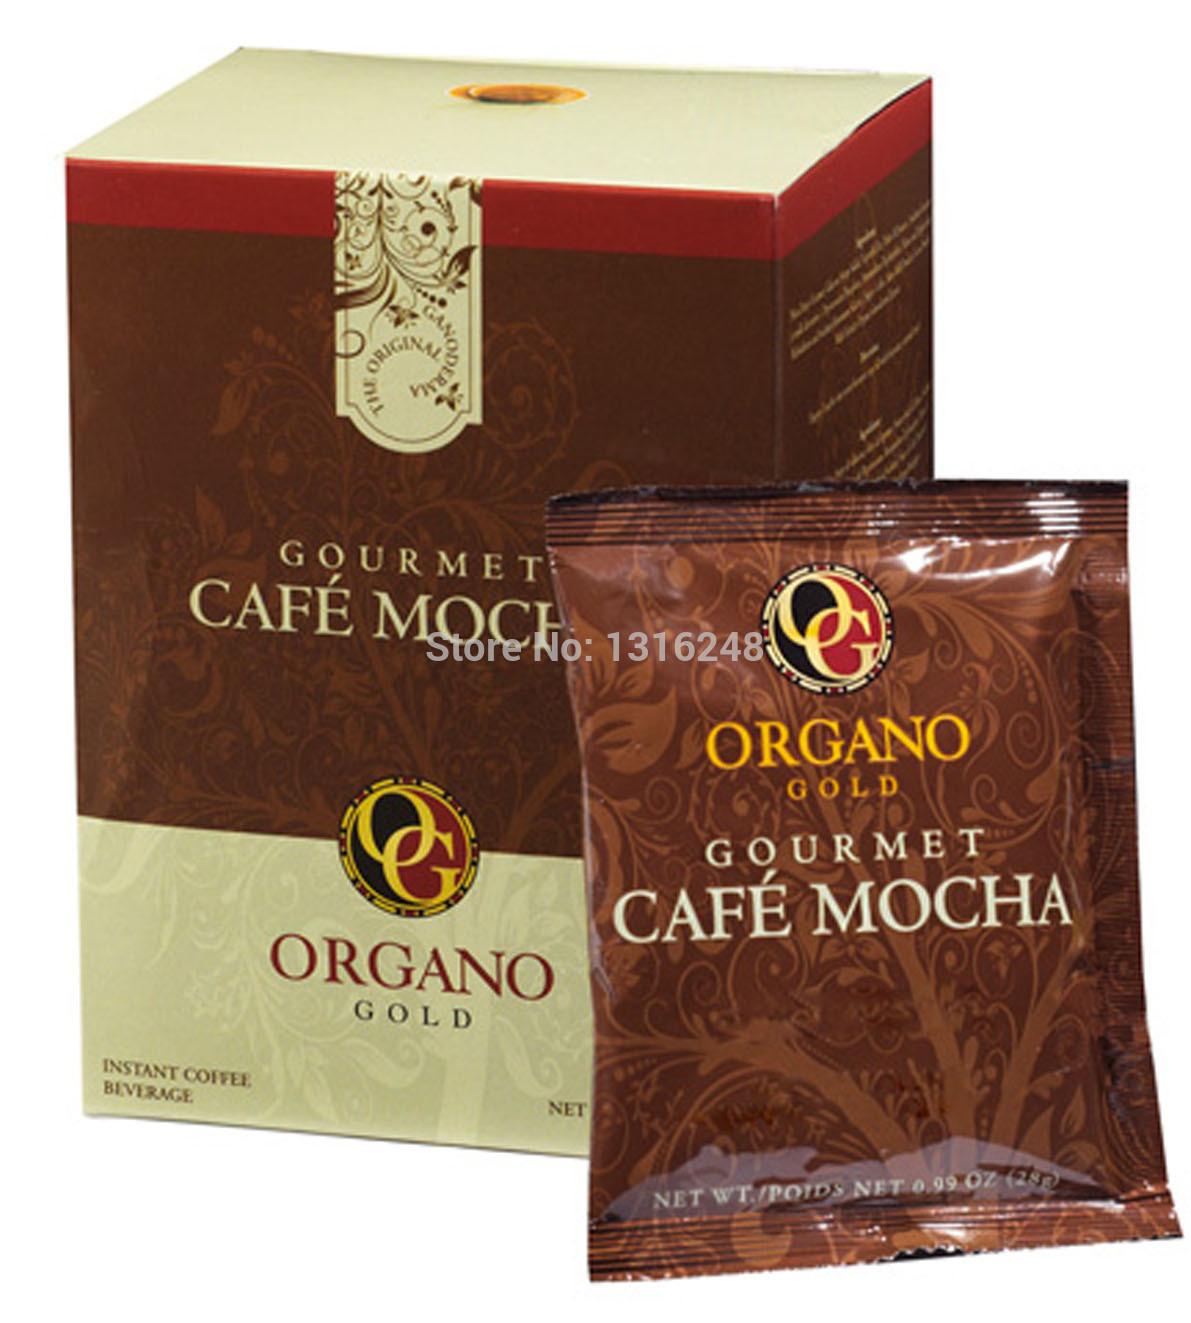 Organo Gold organic gold ganoderma lucidum health coffee select mocha coffee 420g Free Shipping